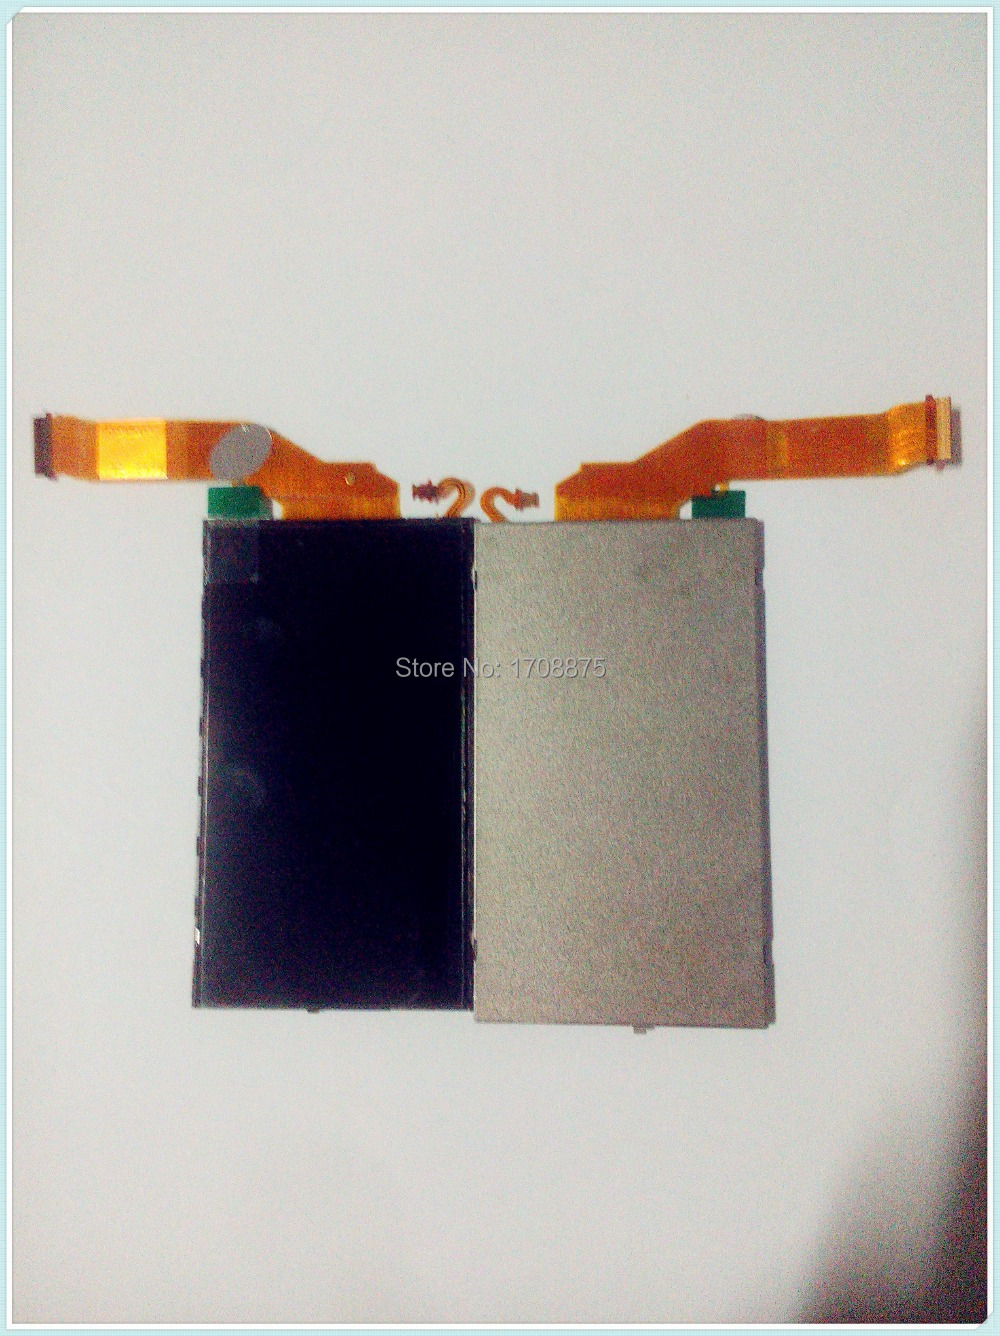 NEW LCD Display Screen For CANON IXUS1000 HS SD4500 IXY50S Digital Camera Screen Repair Parts + Backlight + Glass(China (Mainland))